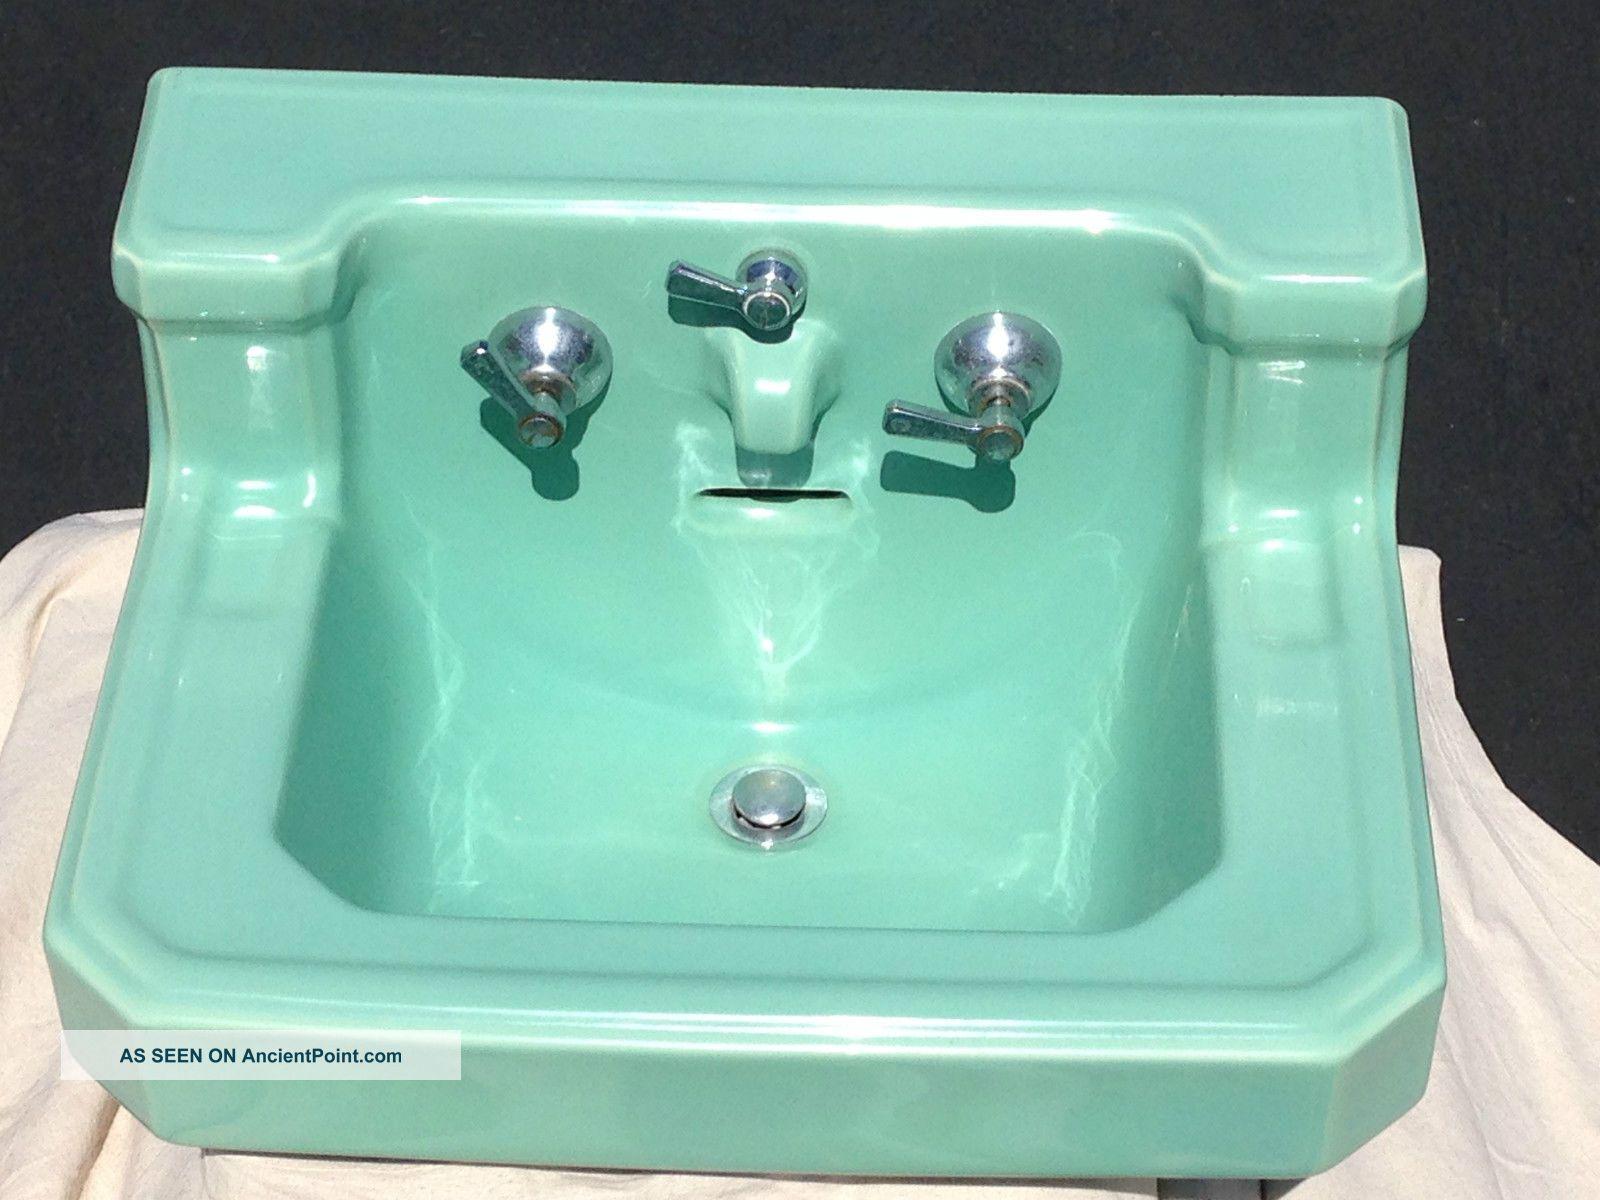 Vintage American Standard Seafoam Green Bathroom Sink Porcelain Integrated Spout Sinks photo